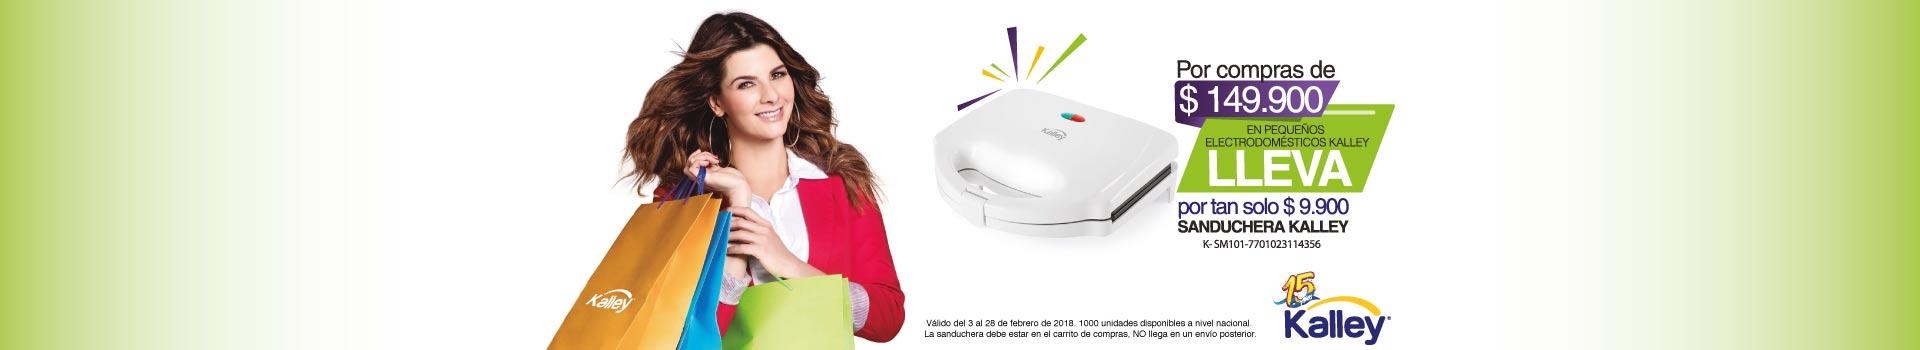 CAT-PREP-ALI-1-menores-compras-superiores149900-pequeño-electro-kalley-lleva-sanduchera-cat-febrero14-16